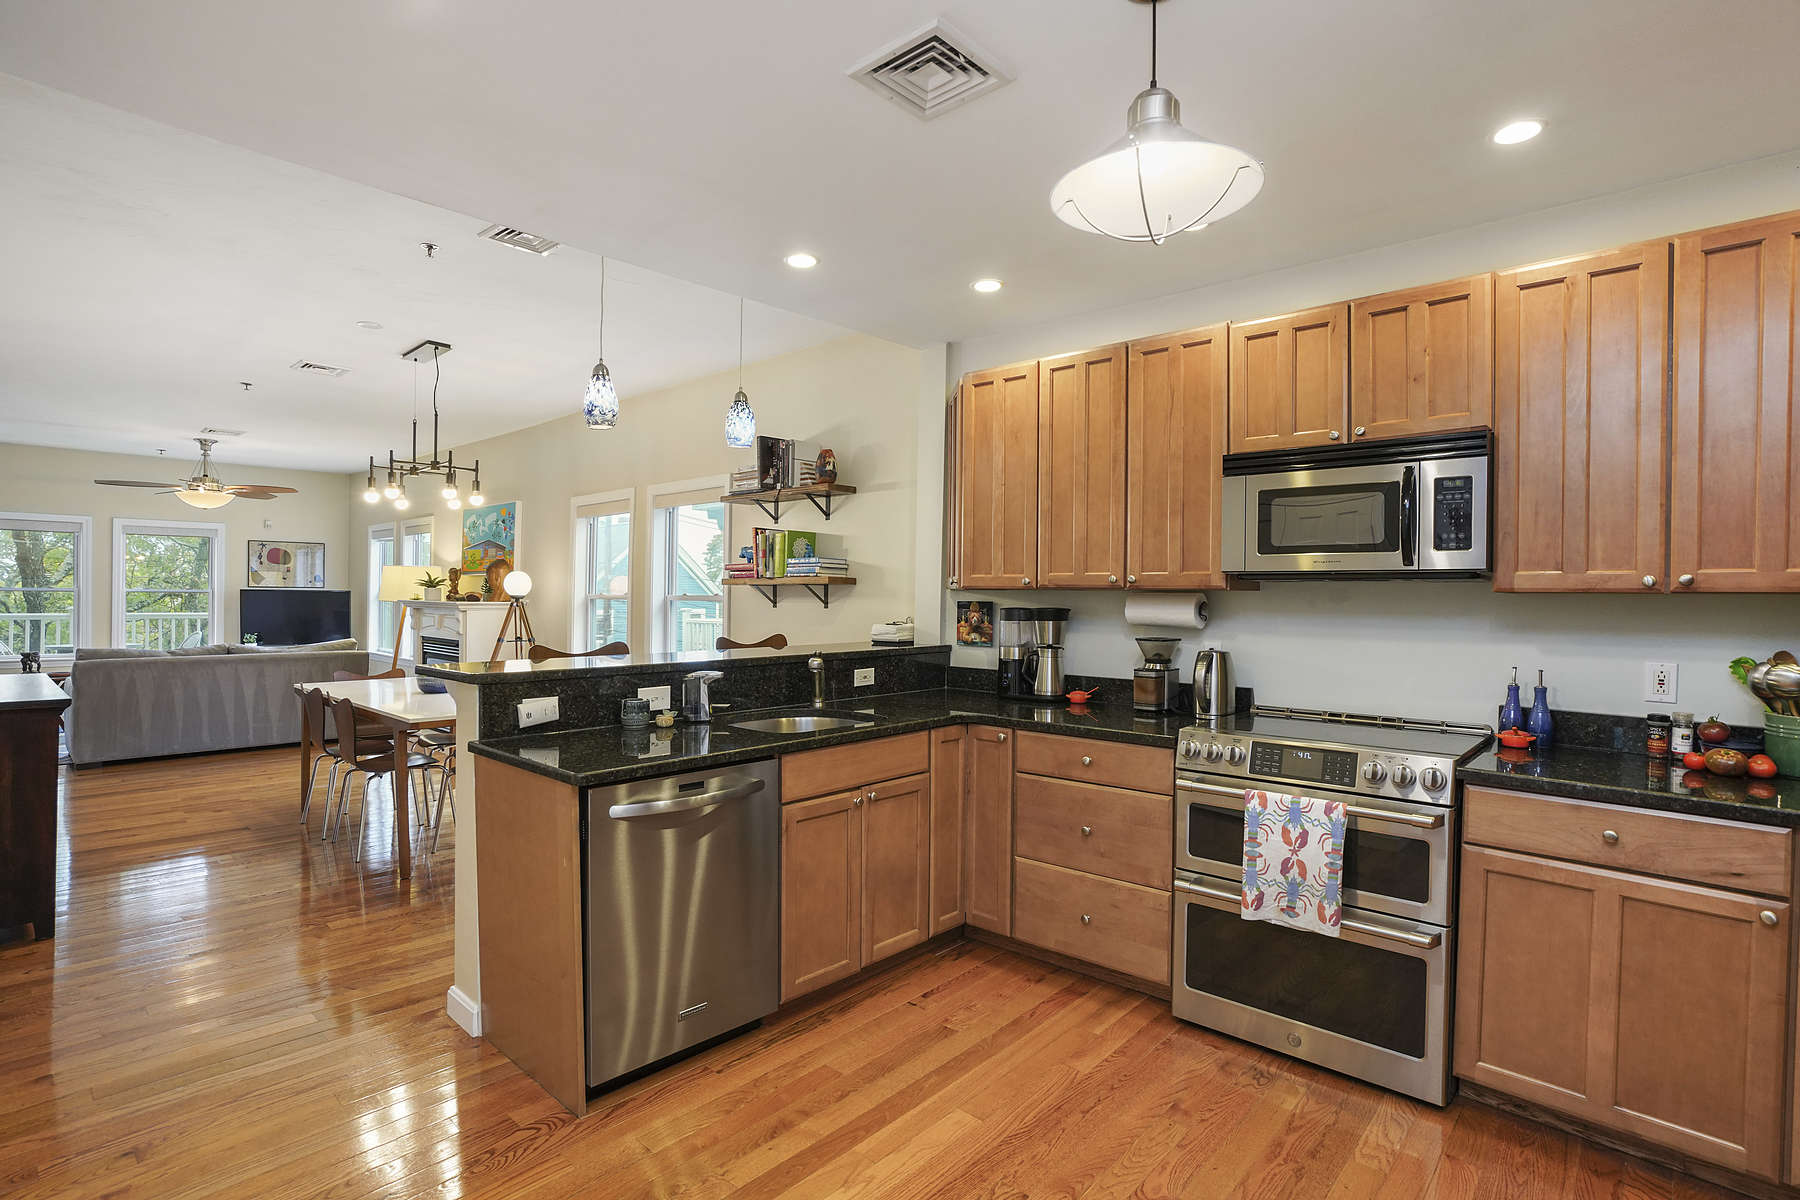 Condominiums 용 매매 에 34 Madison Street, Unit 2 34 Madison St 2, Somerville, 매사추세츠 02143 미국